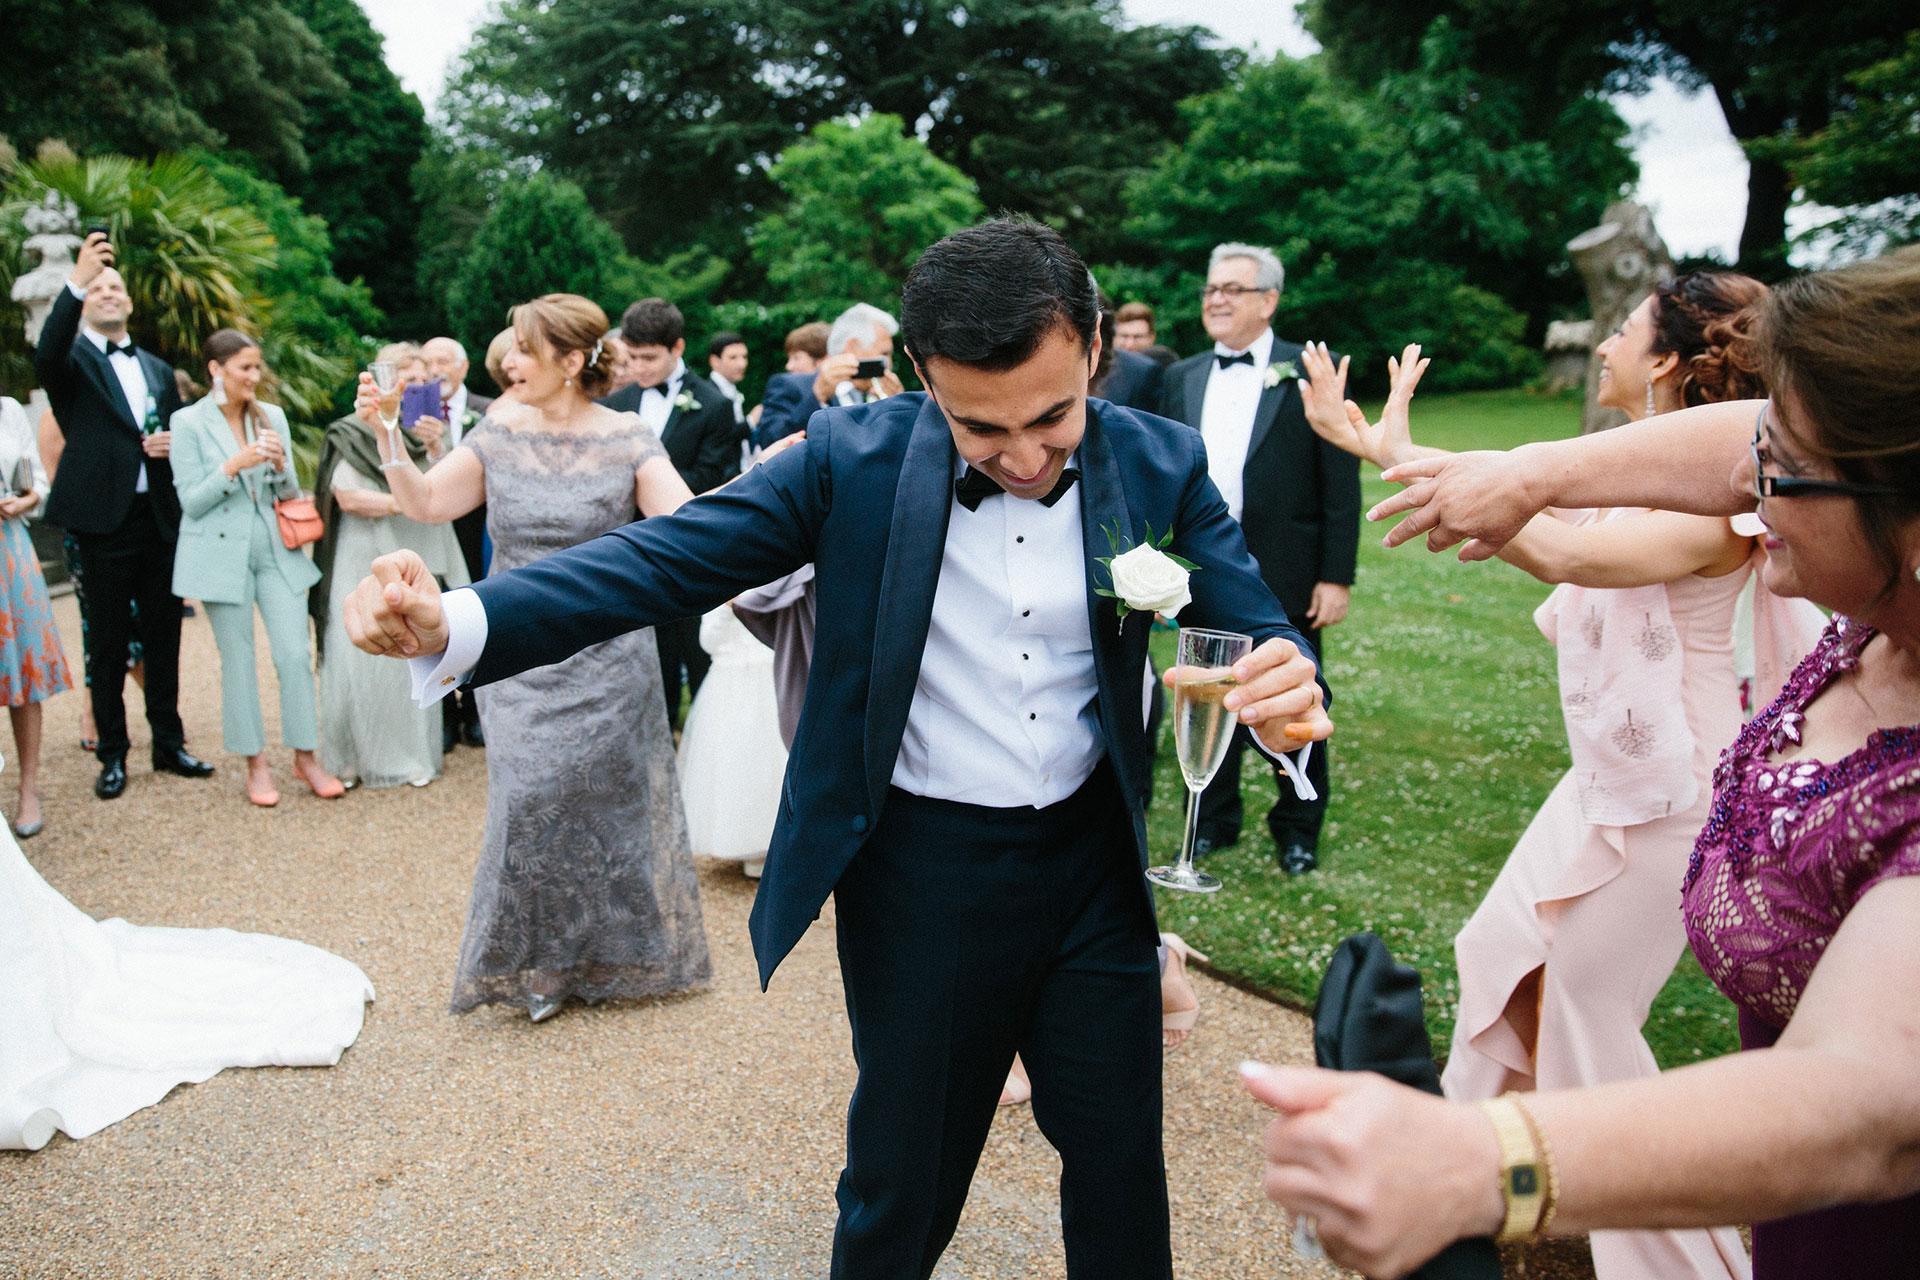 Syon-Park-Wedding-Photographer--_-Michael-Newington-Gray-254.jpg